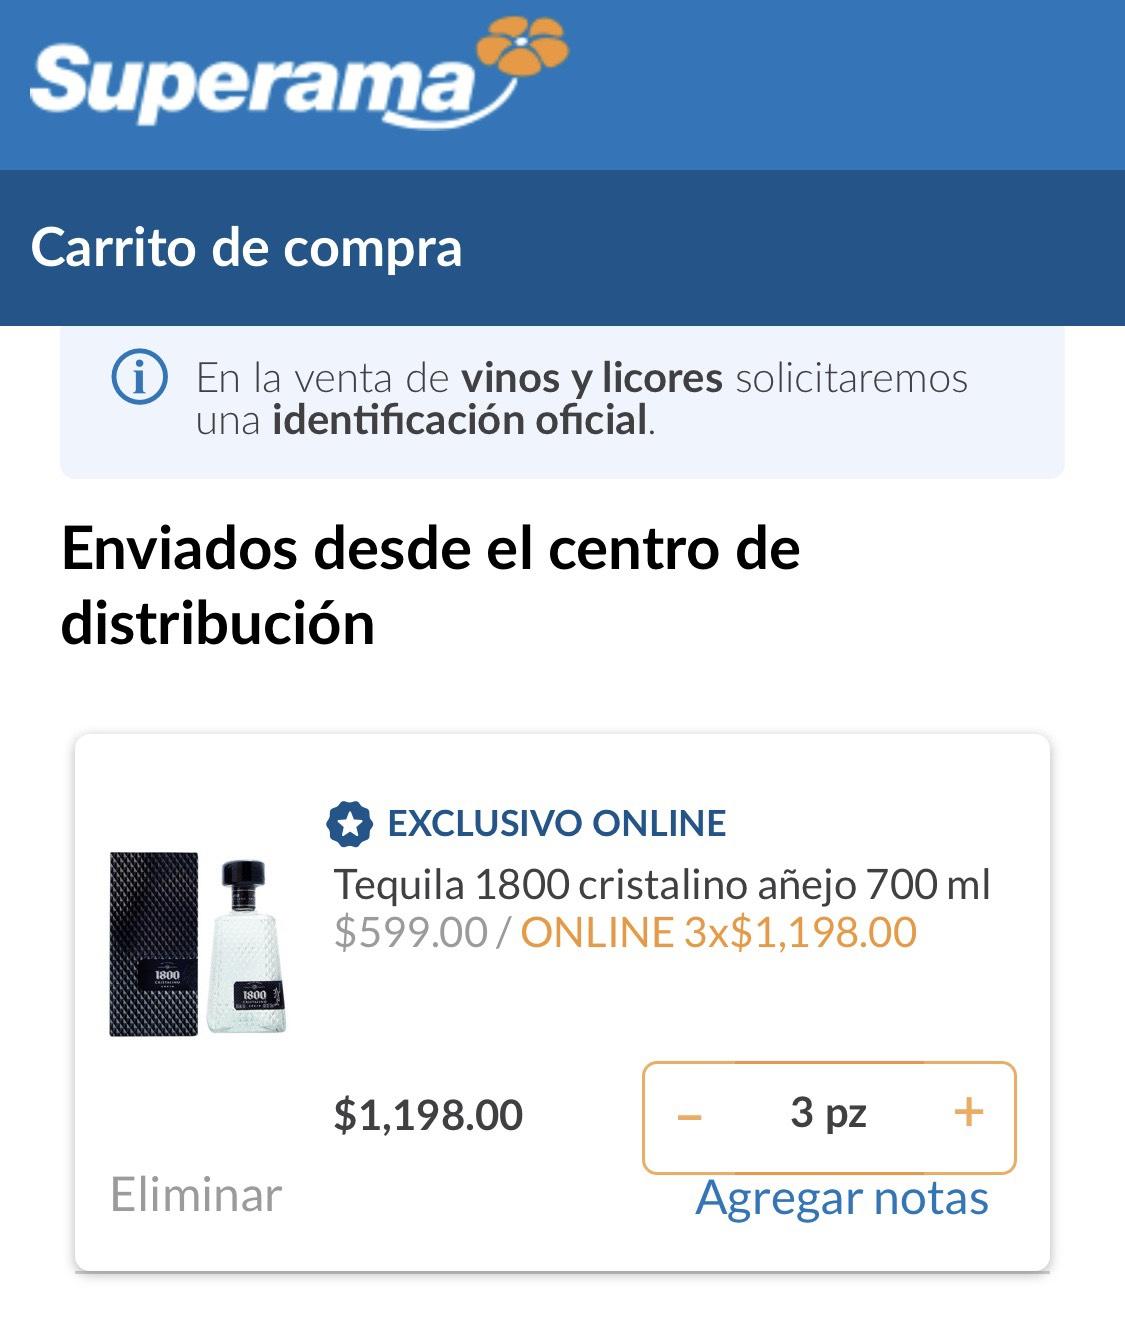 Superama: Tequila 1800 cristalino añejo 3 por $1,198